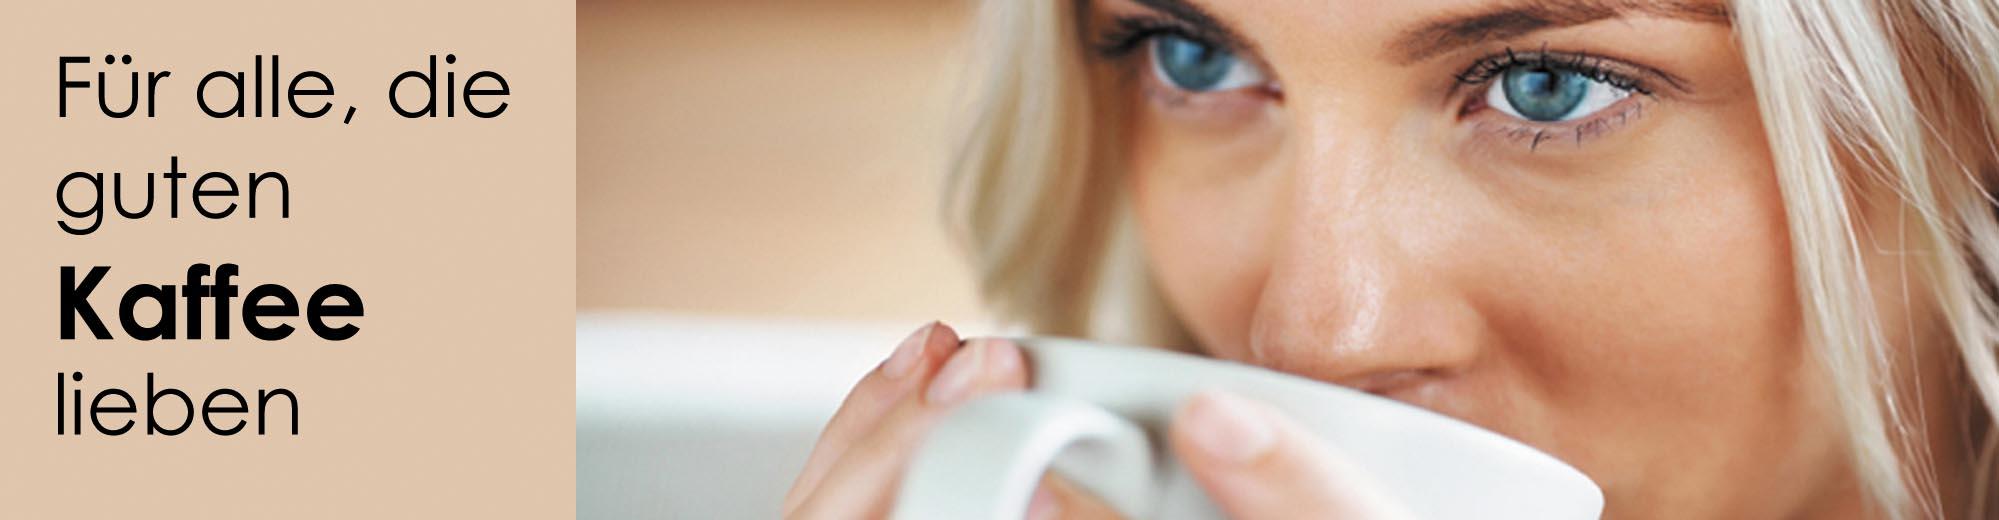 Kaffee Genuss  - Frau trinkt Kaffee